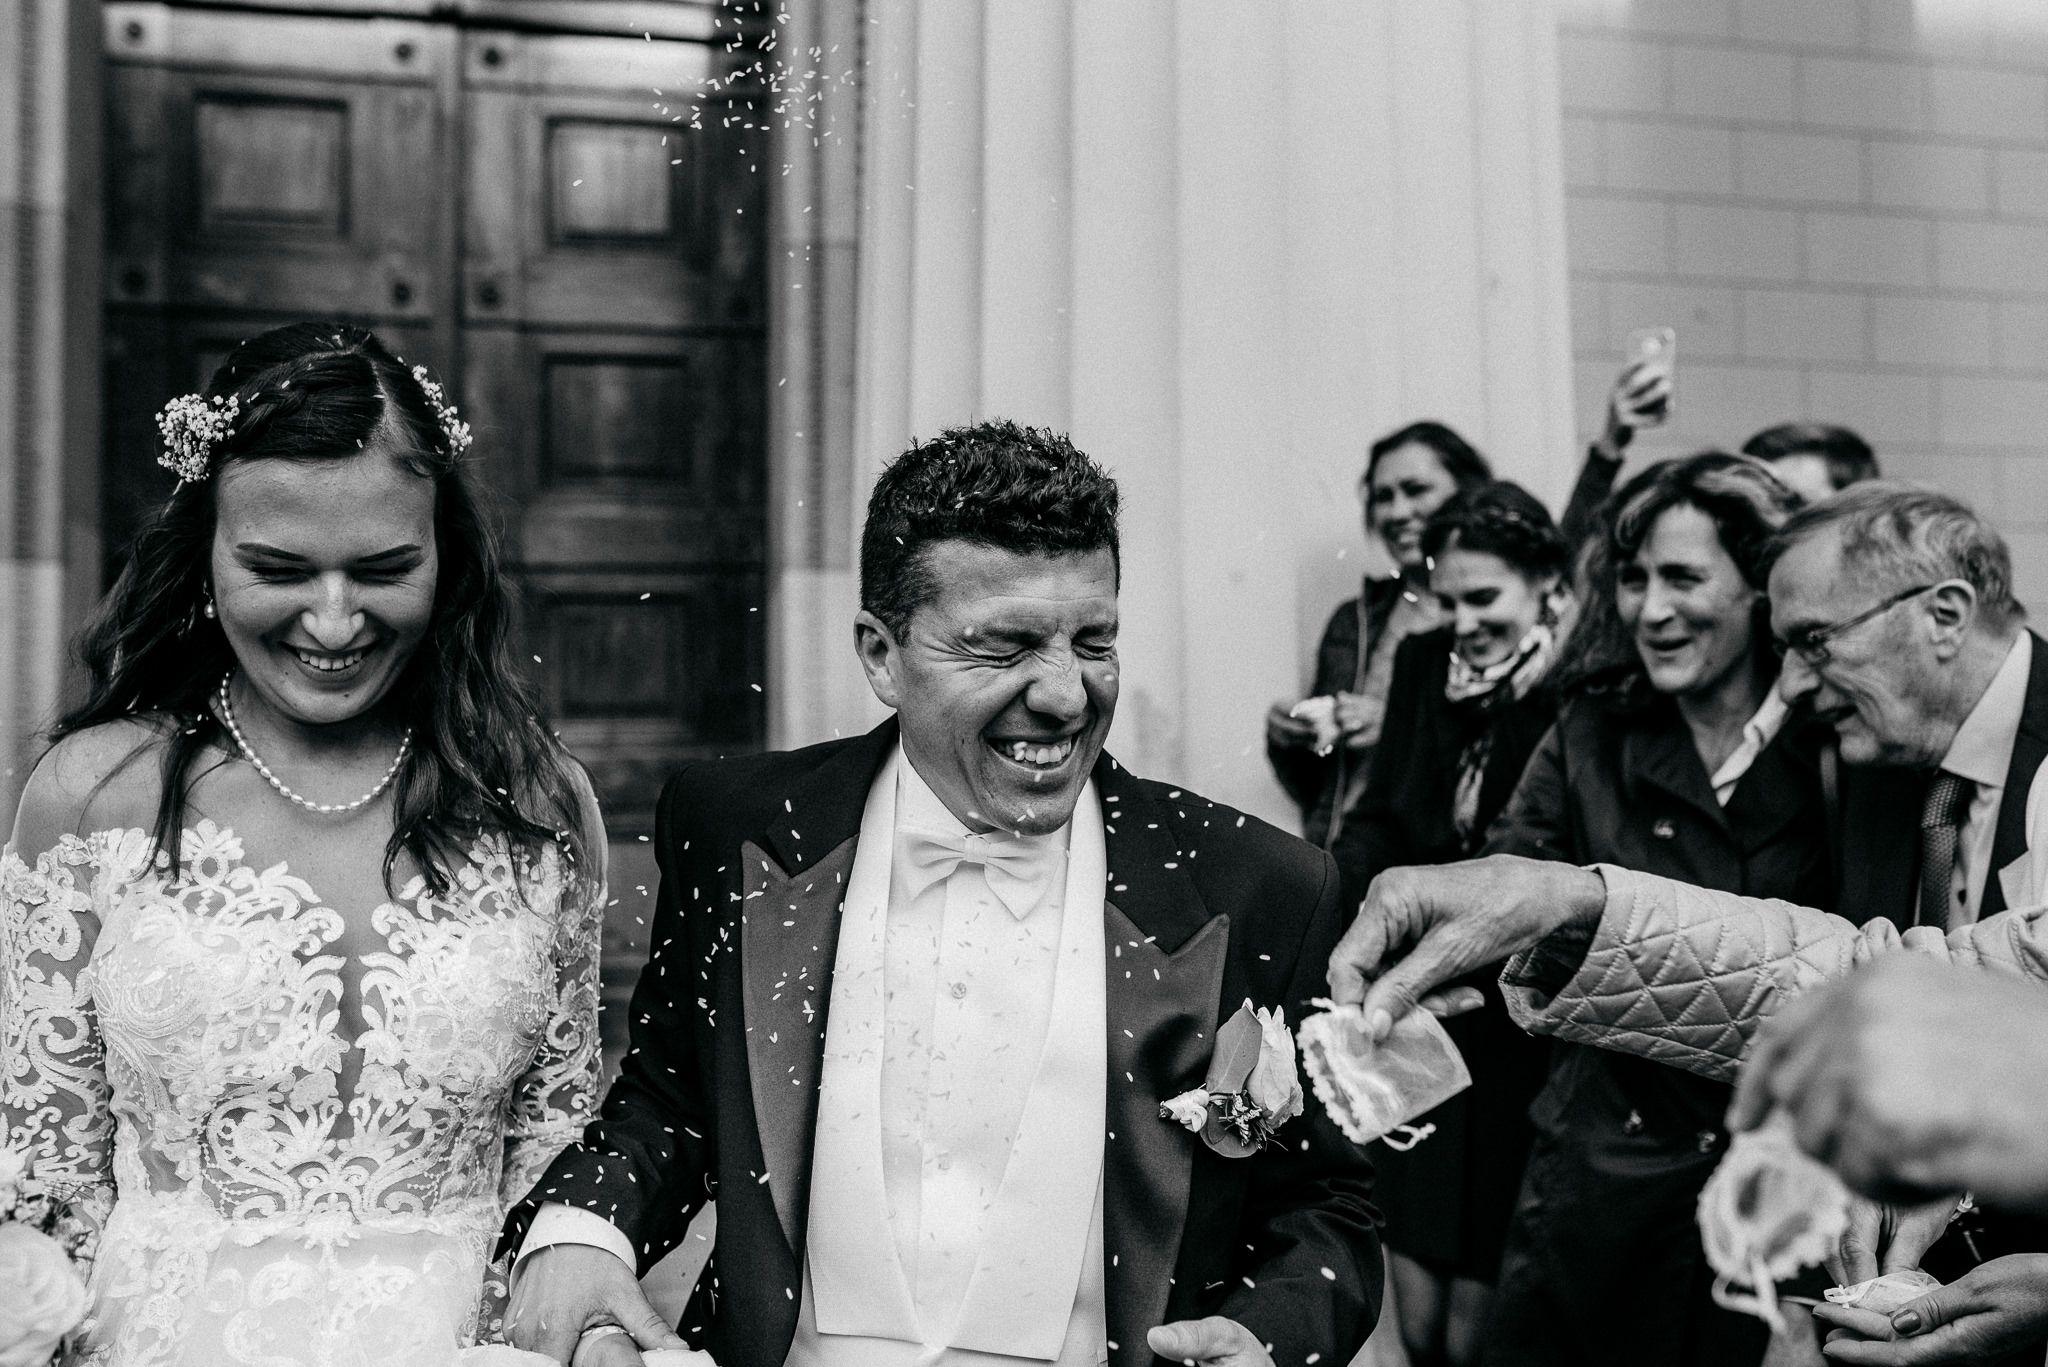 copenhagen-wedding-photographer-2.jpg